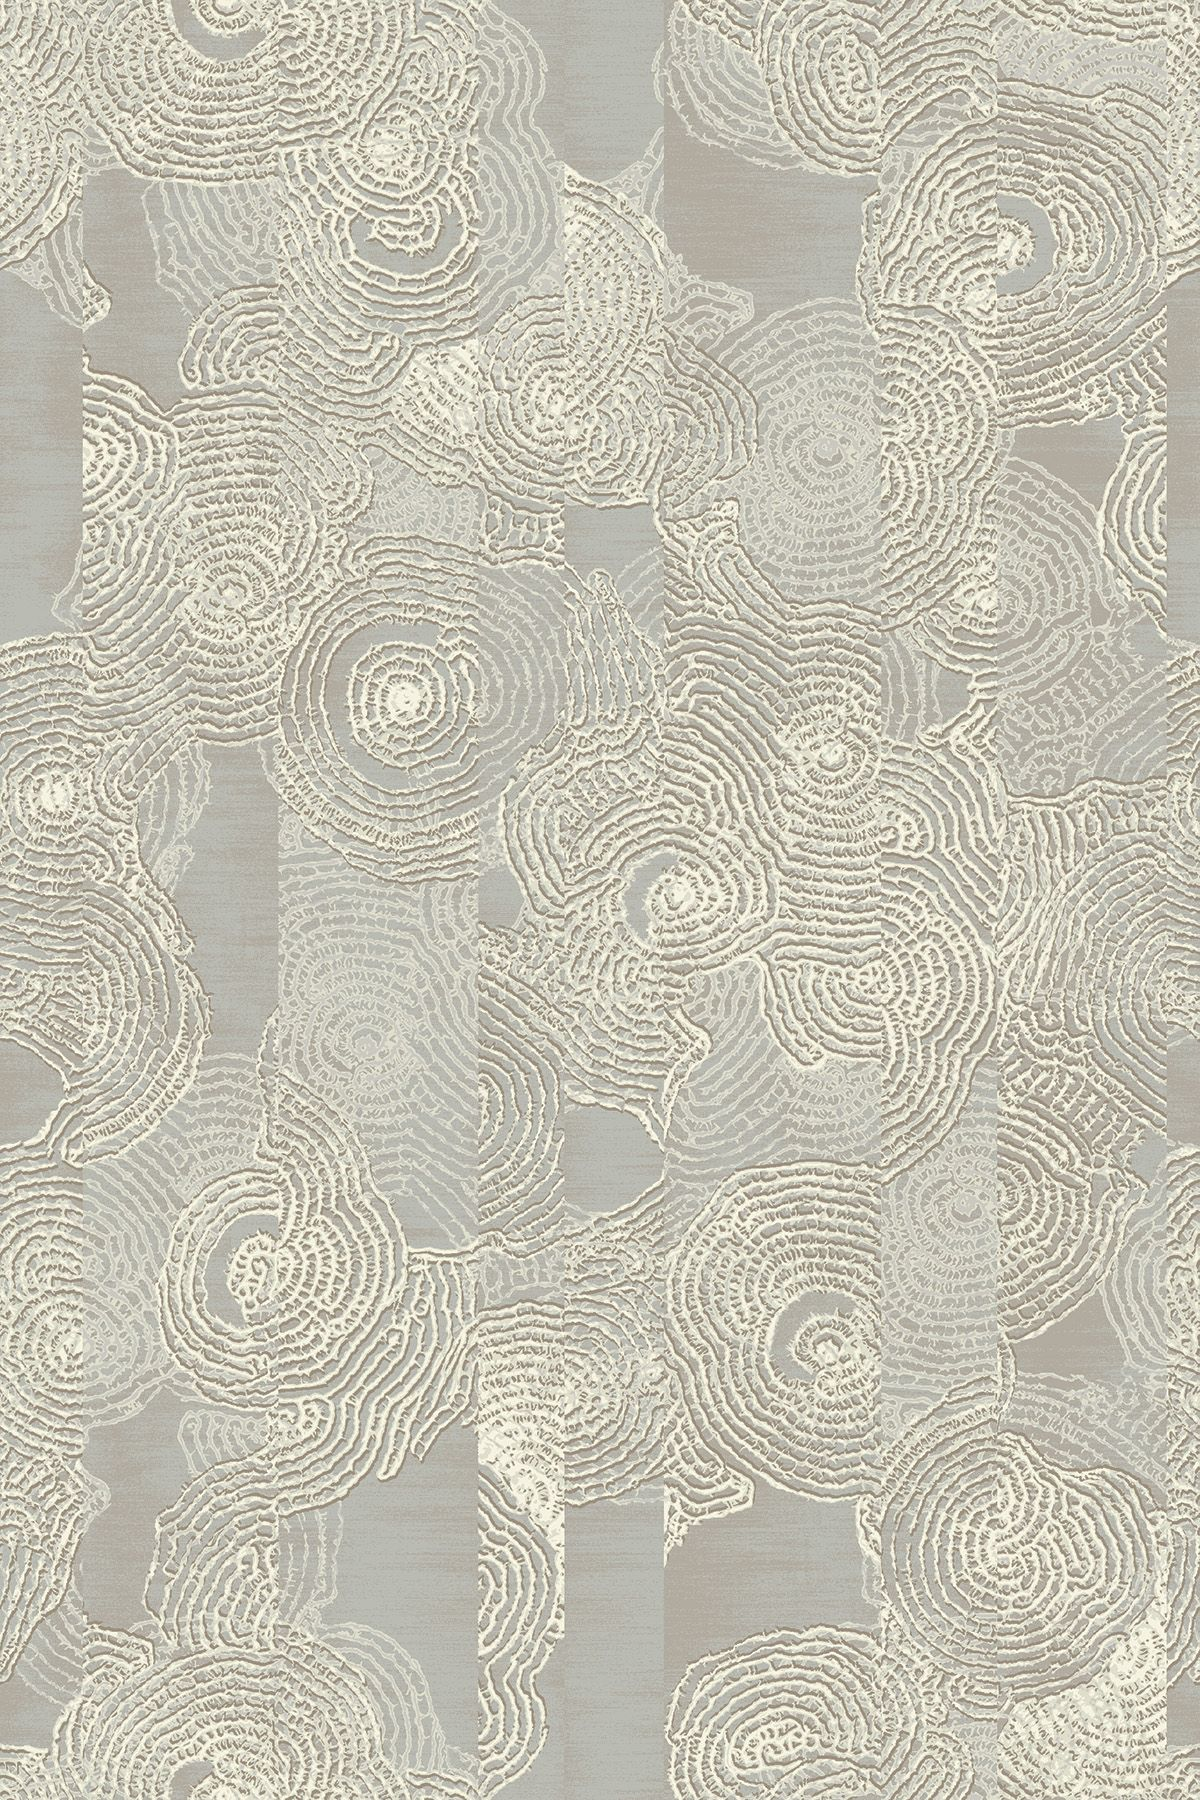 Durkan Definity Lakir Textured carpet, Patterned carpet